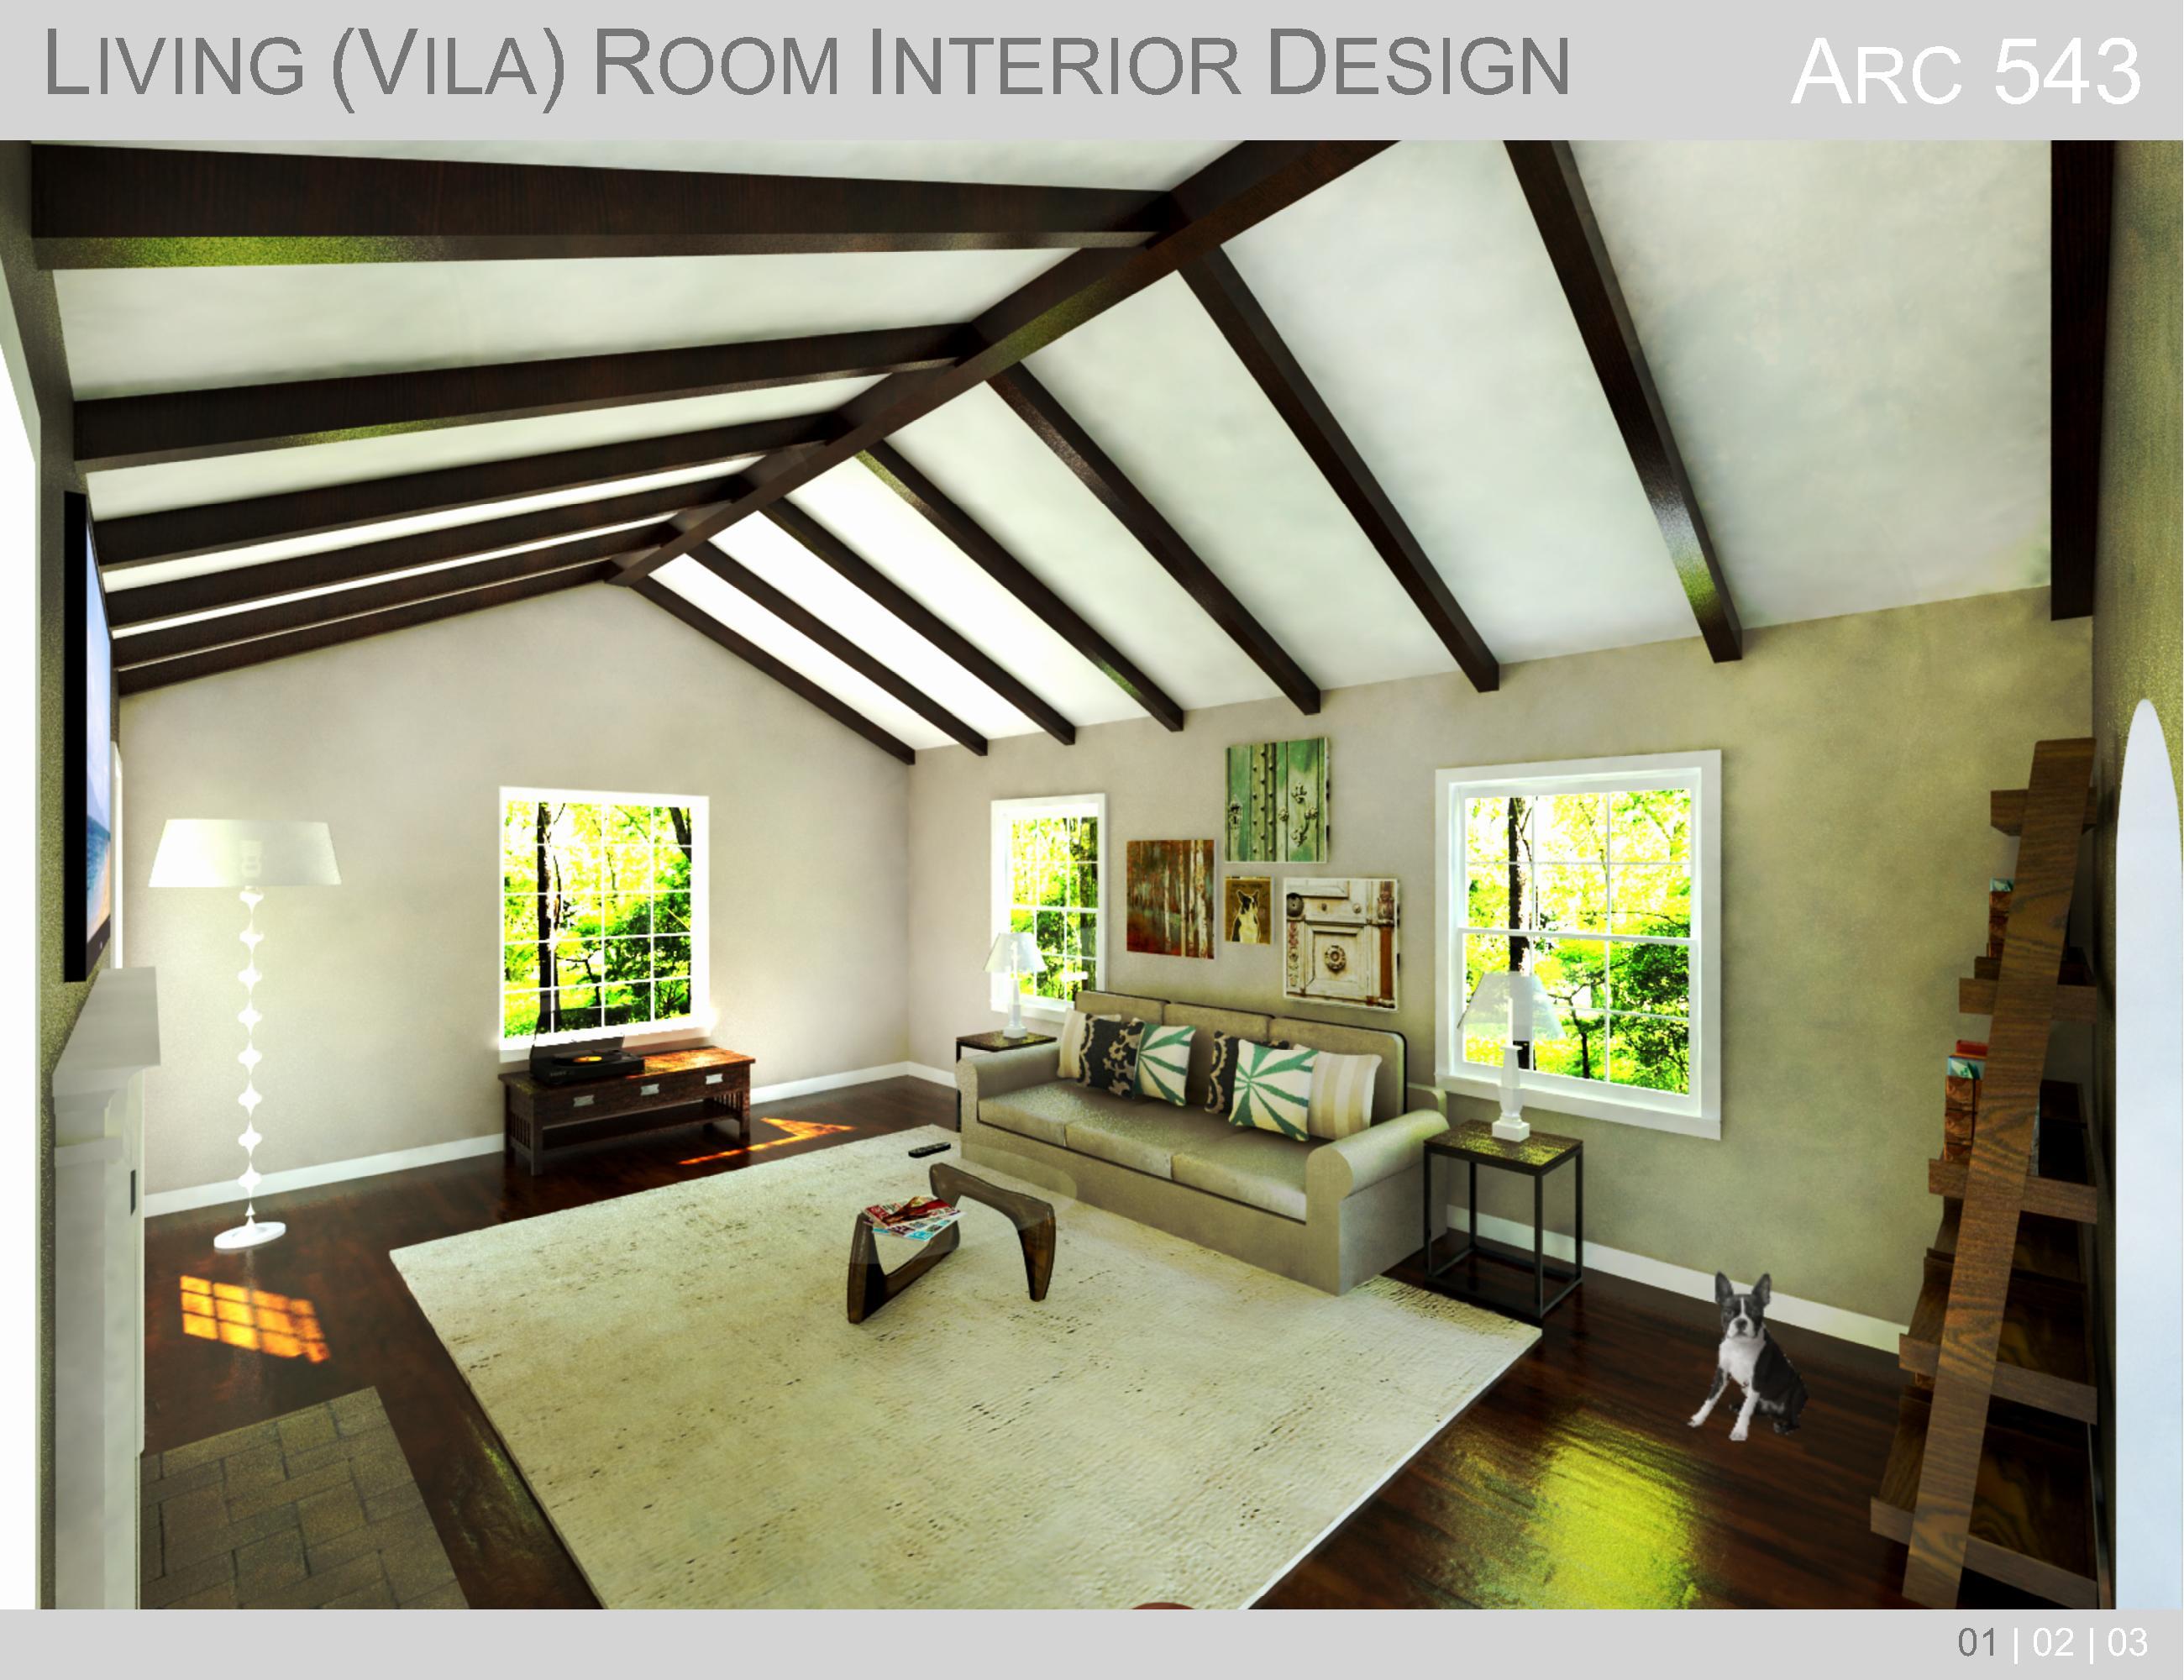 Viewdesignerproject Projecthome Interior